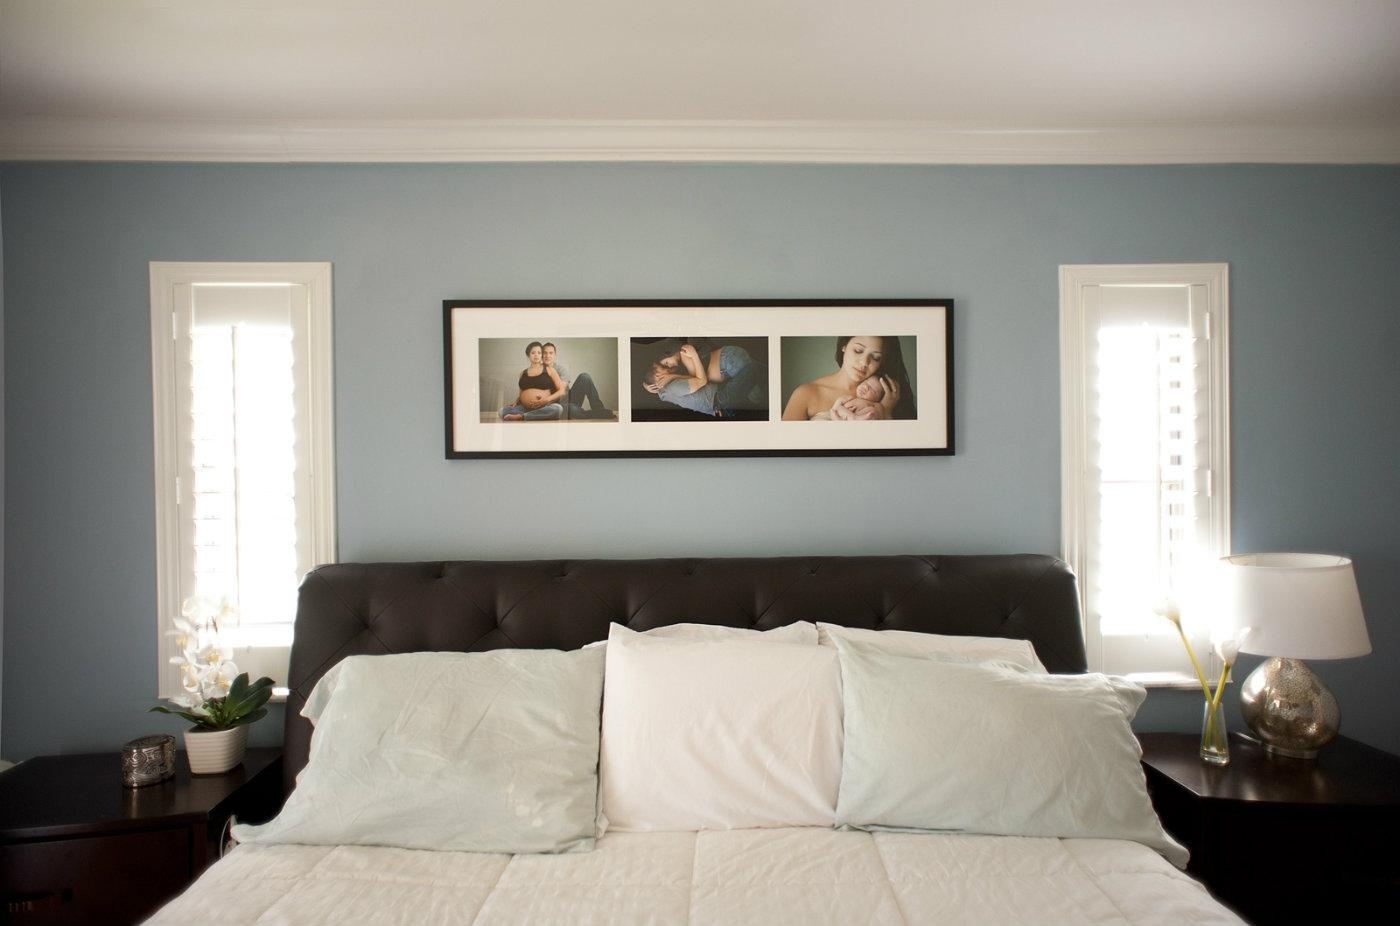 Wall Art Designs: Brilliant Carving Framed Wall Art For Bedroom Inside Wall Art For Bedrooms (View 17 of 21)